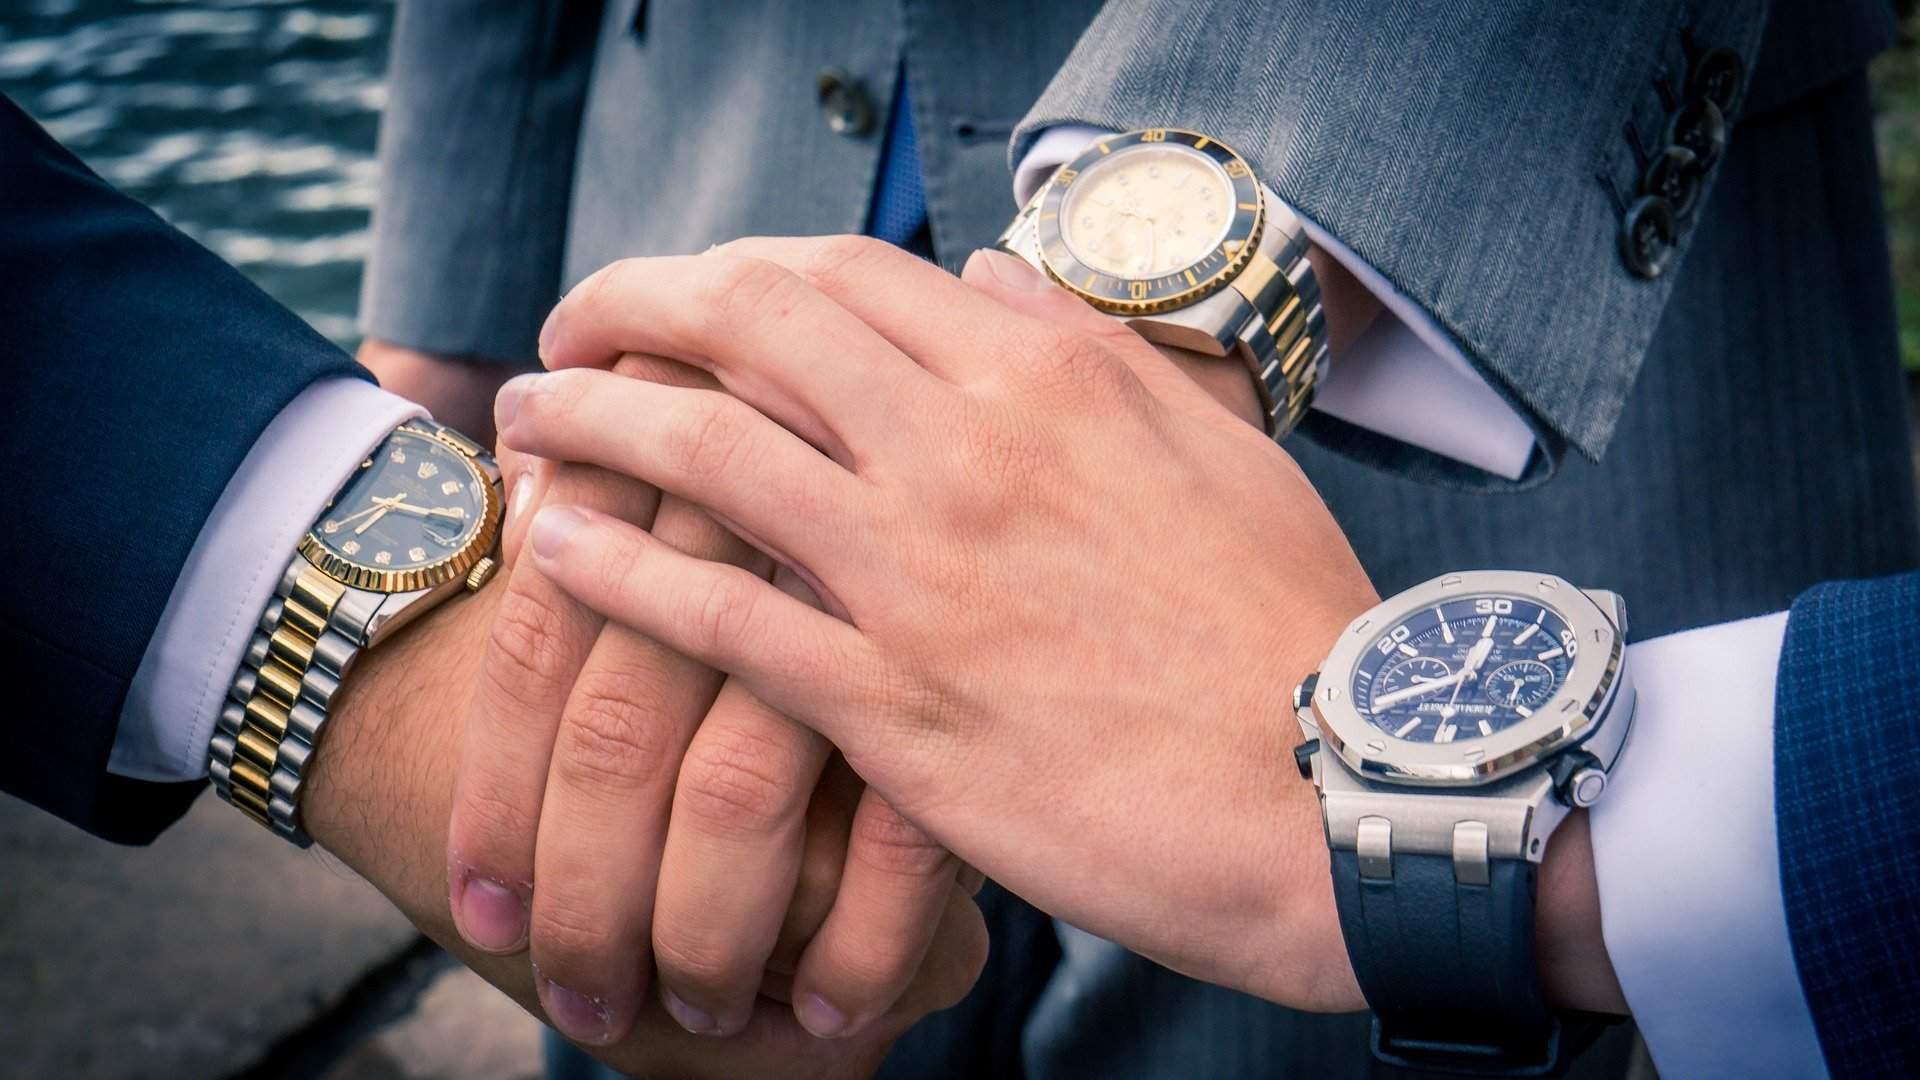 A Rolex on the wrist tells a tale of success.